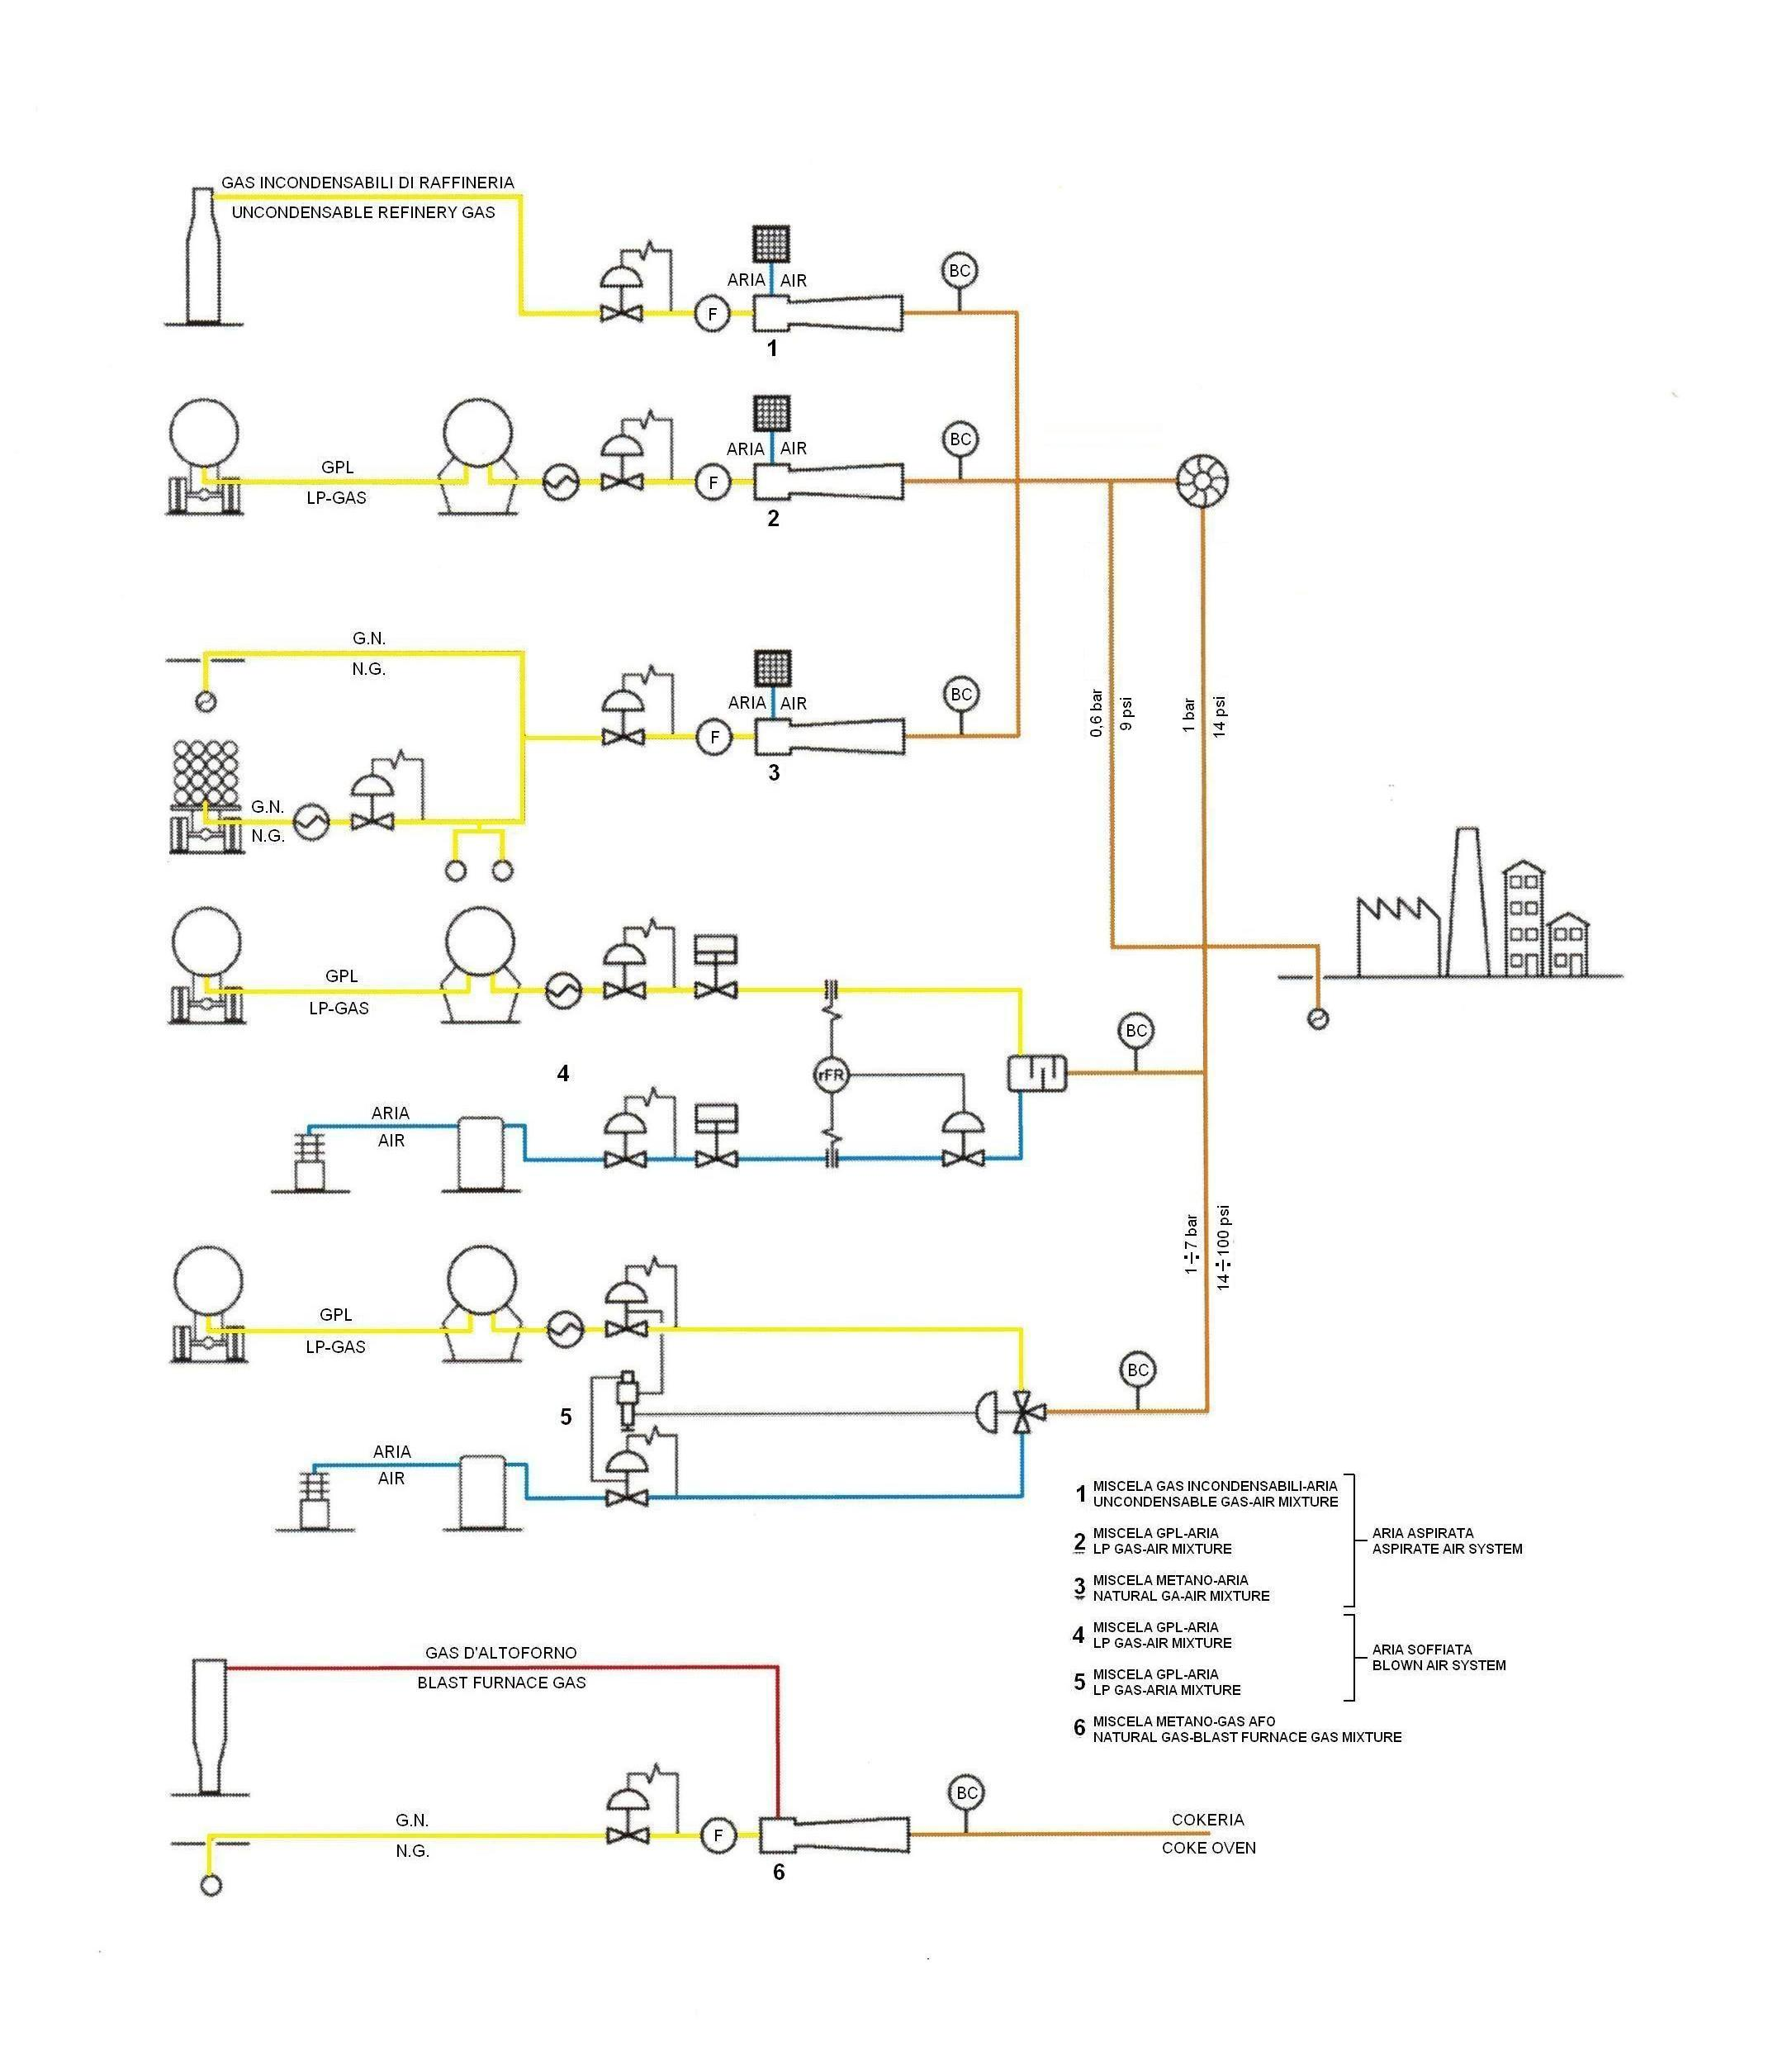 Miscele gpl aria miscele gas gas miscela gas aria for Schema impianto gas dwg